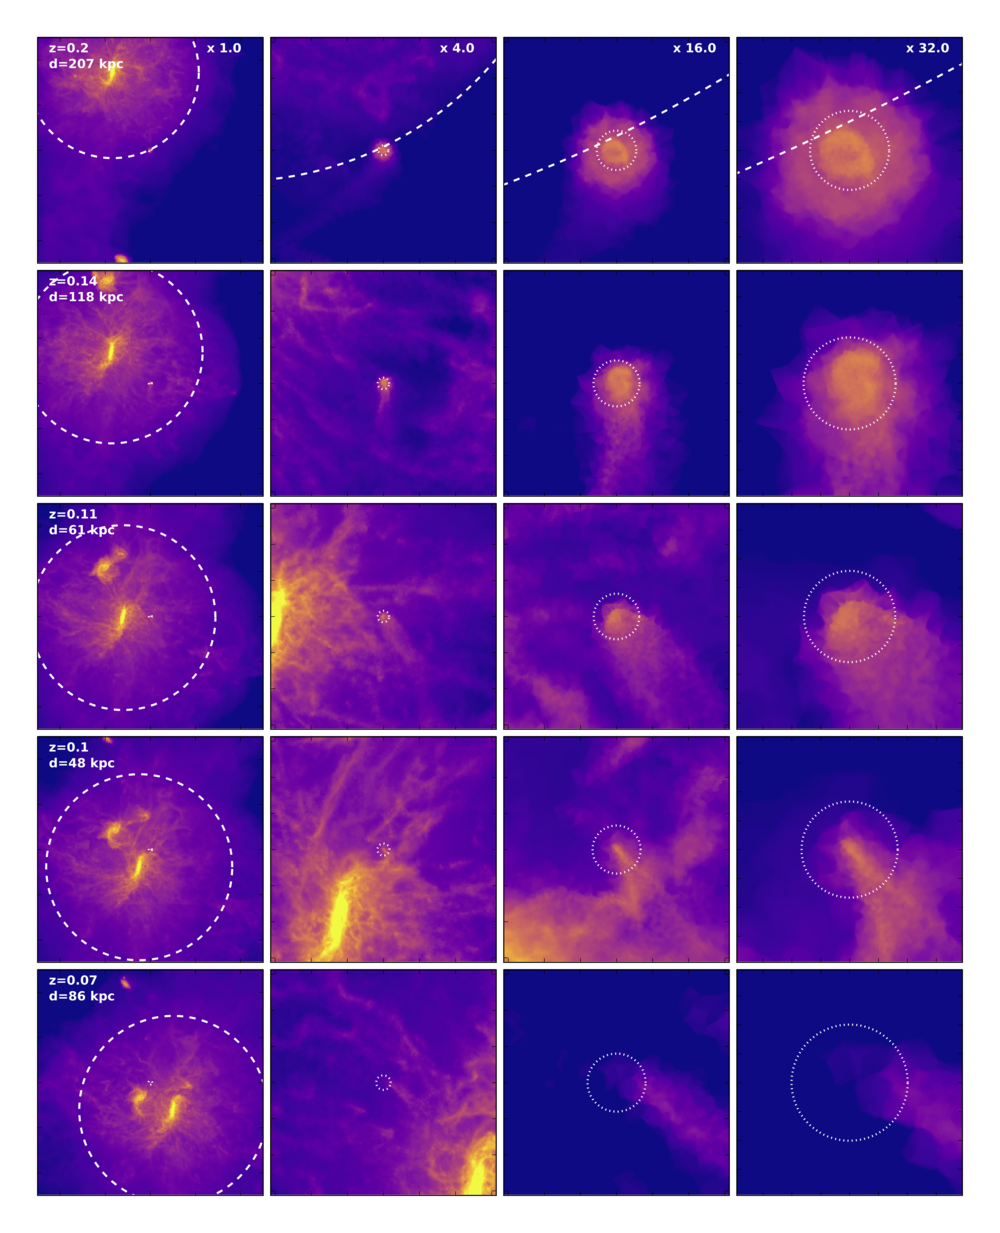 Figure 9 from Simpson et al. 2017 in prep.